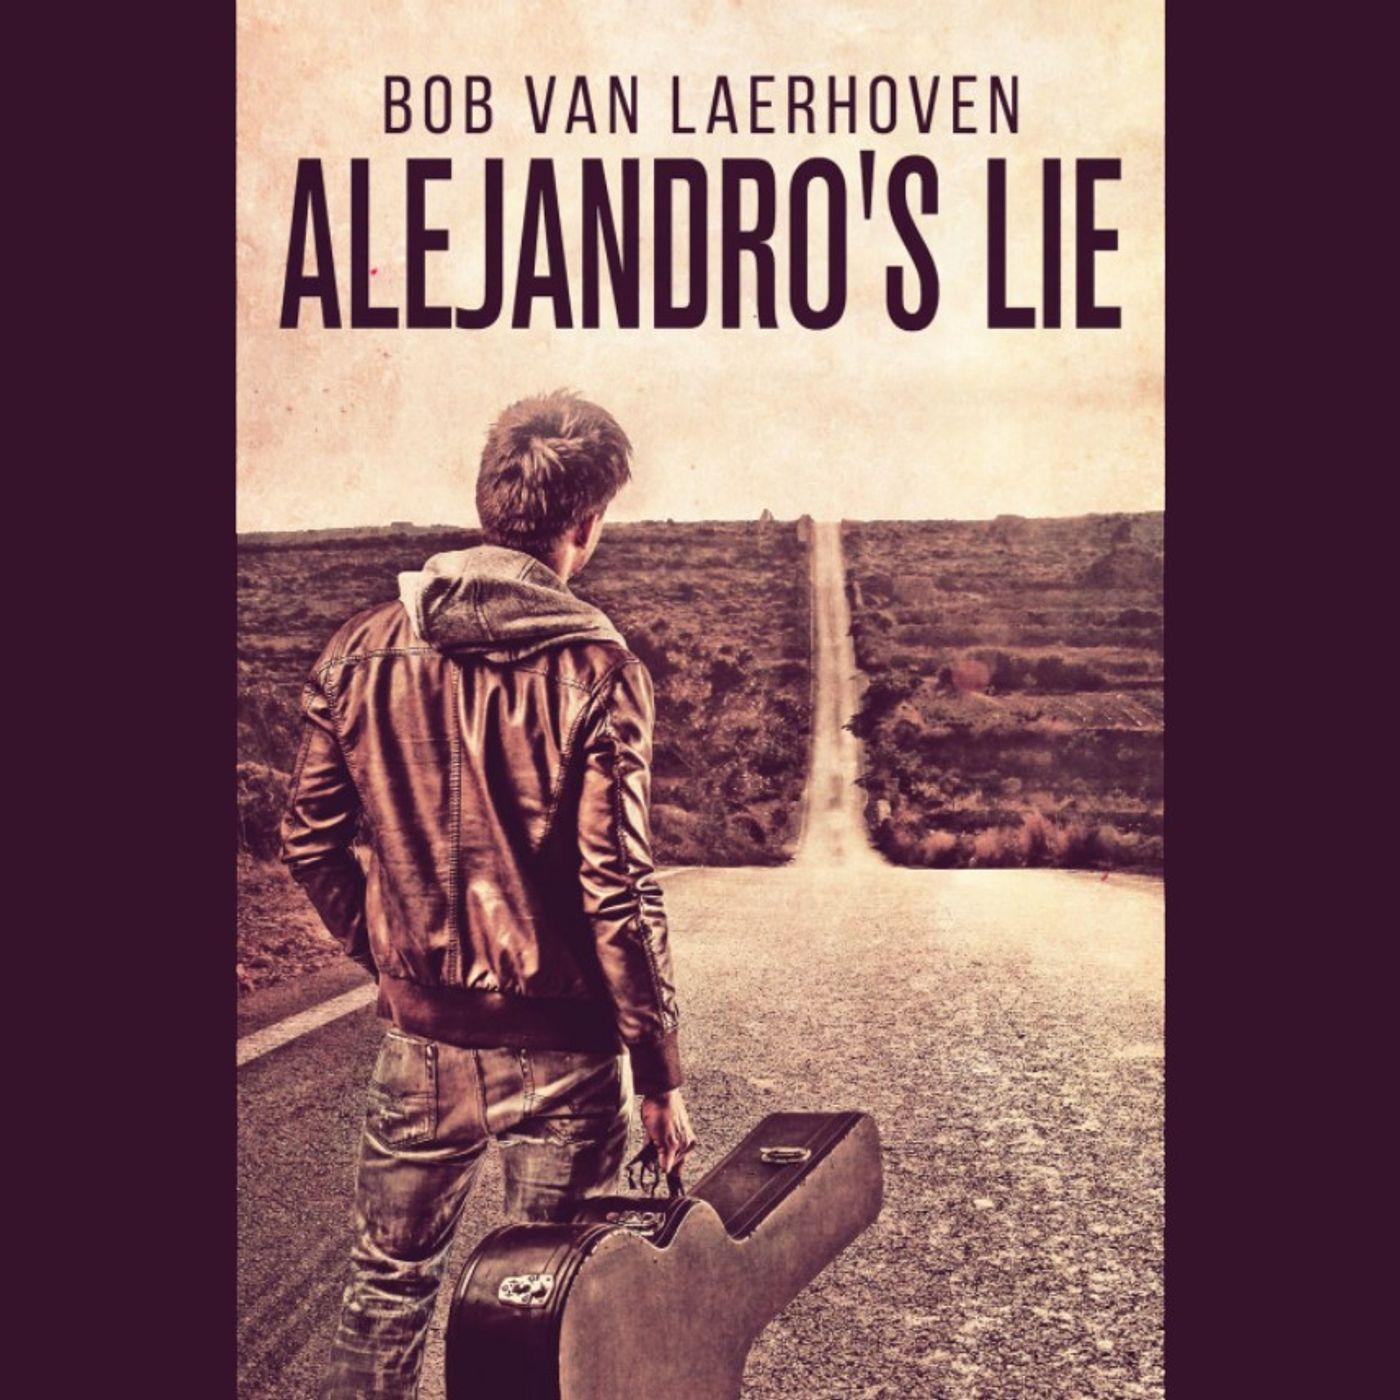 355 -- The Tension Mounts -- with Bob Van Laerhoven